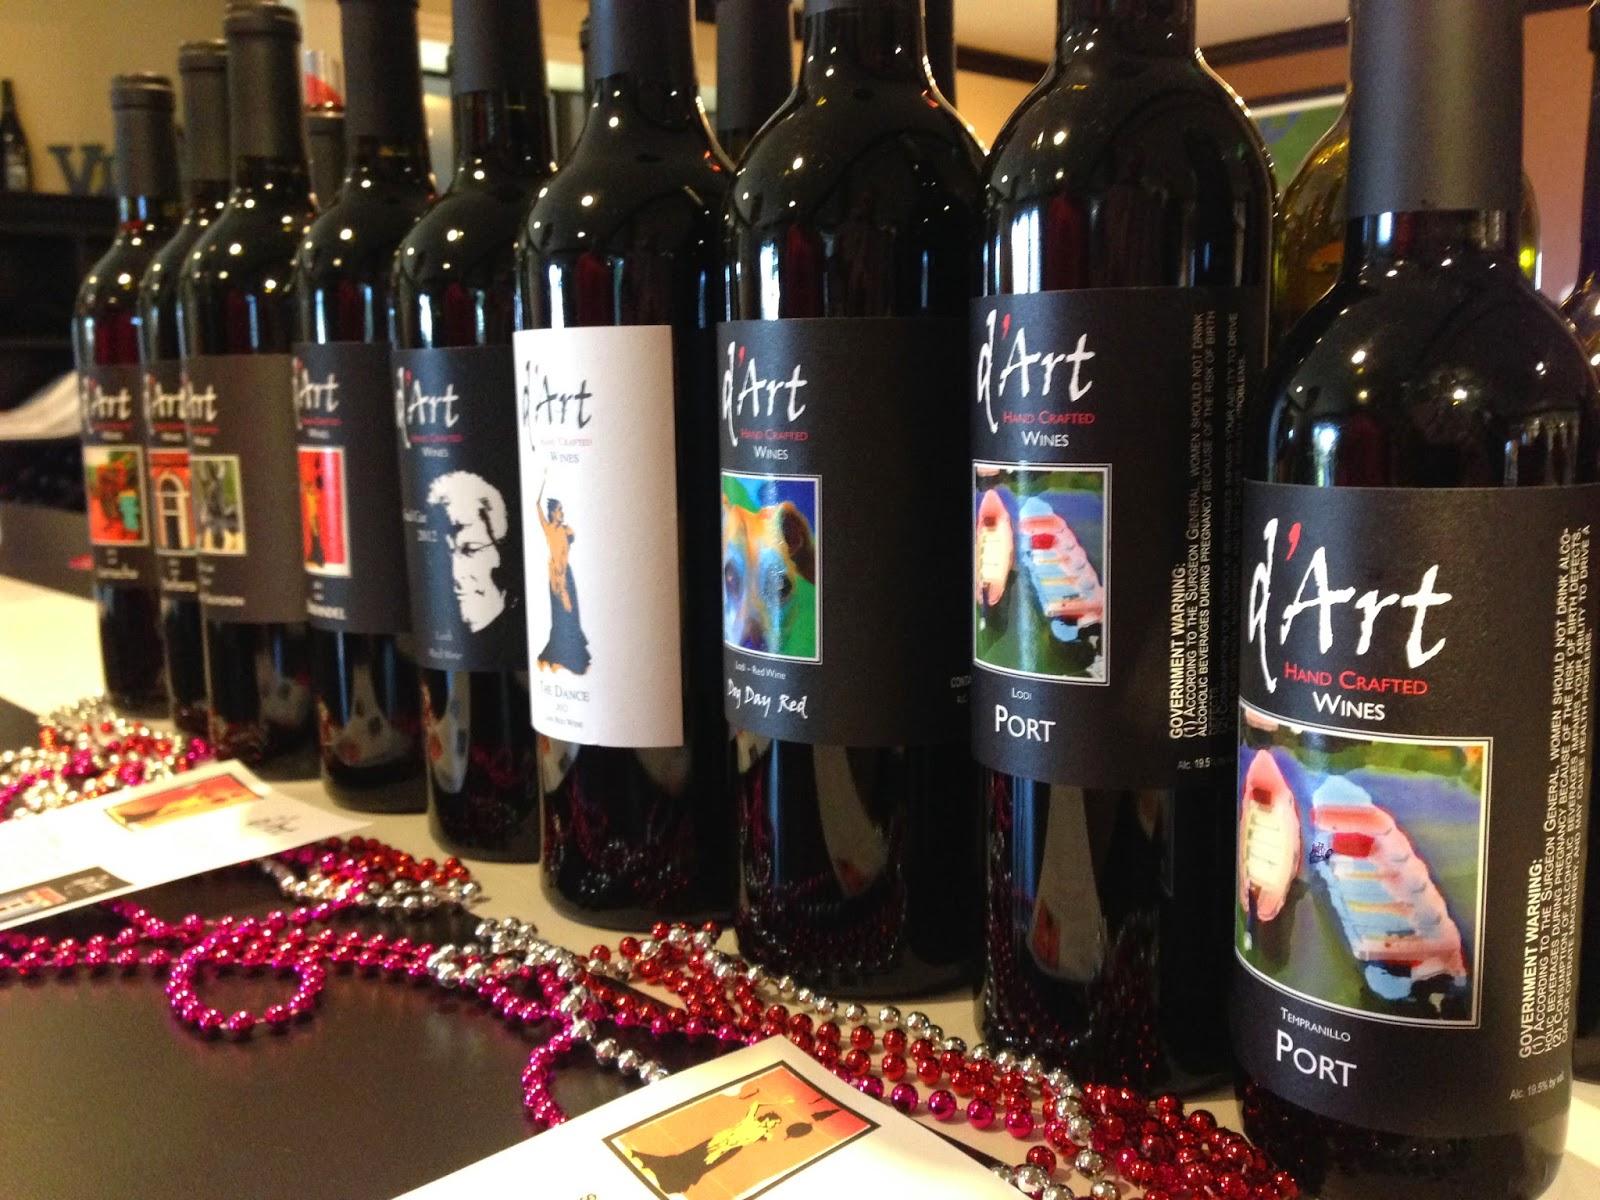 d'Art Wines